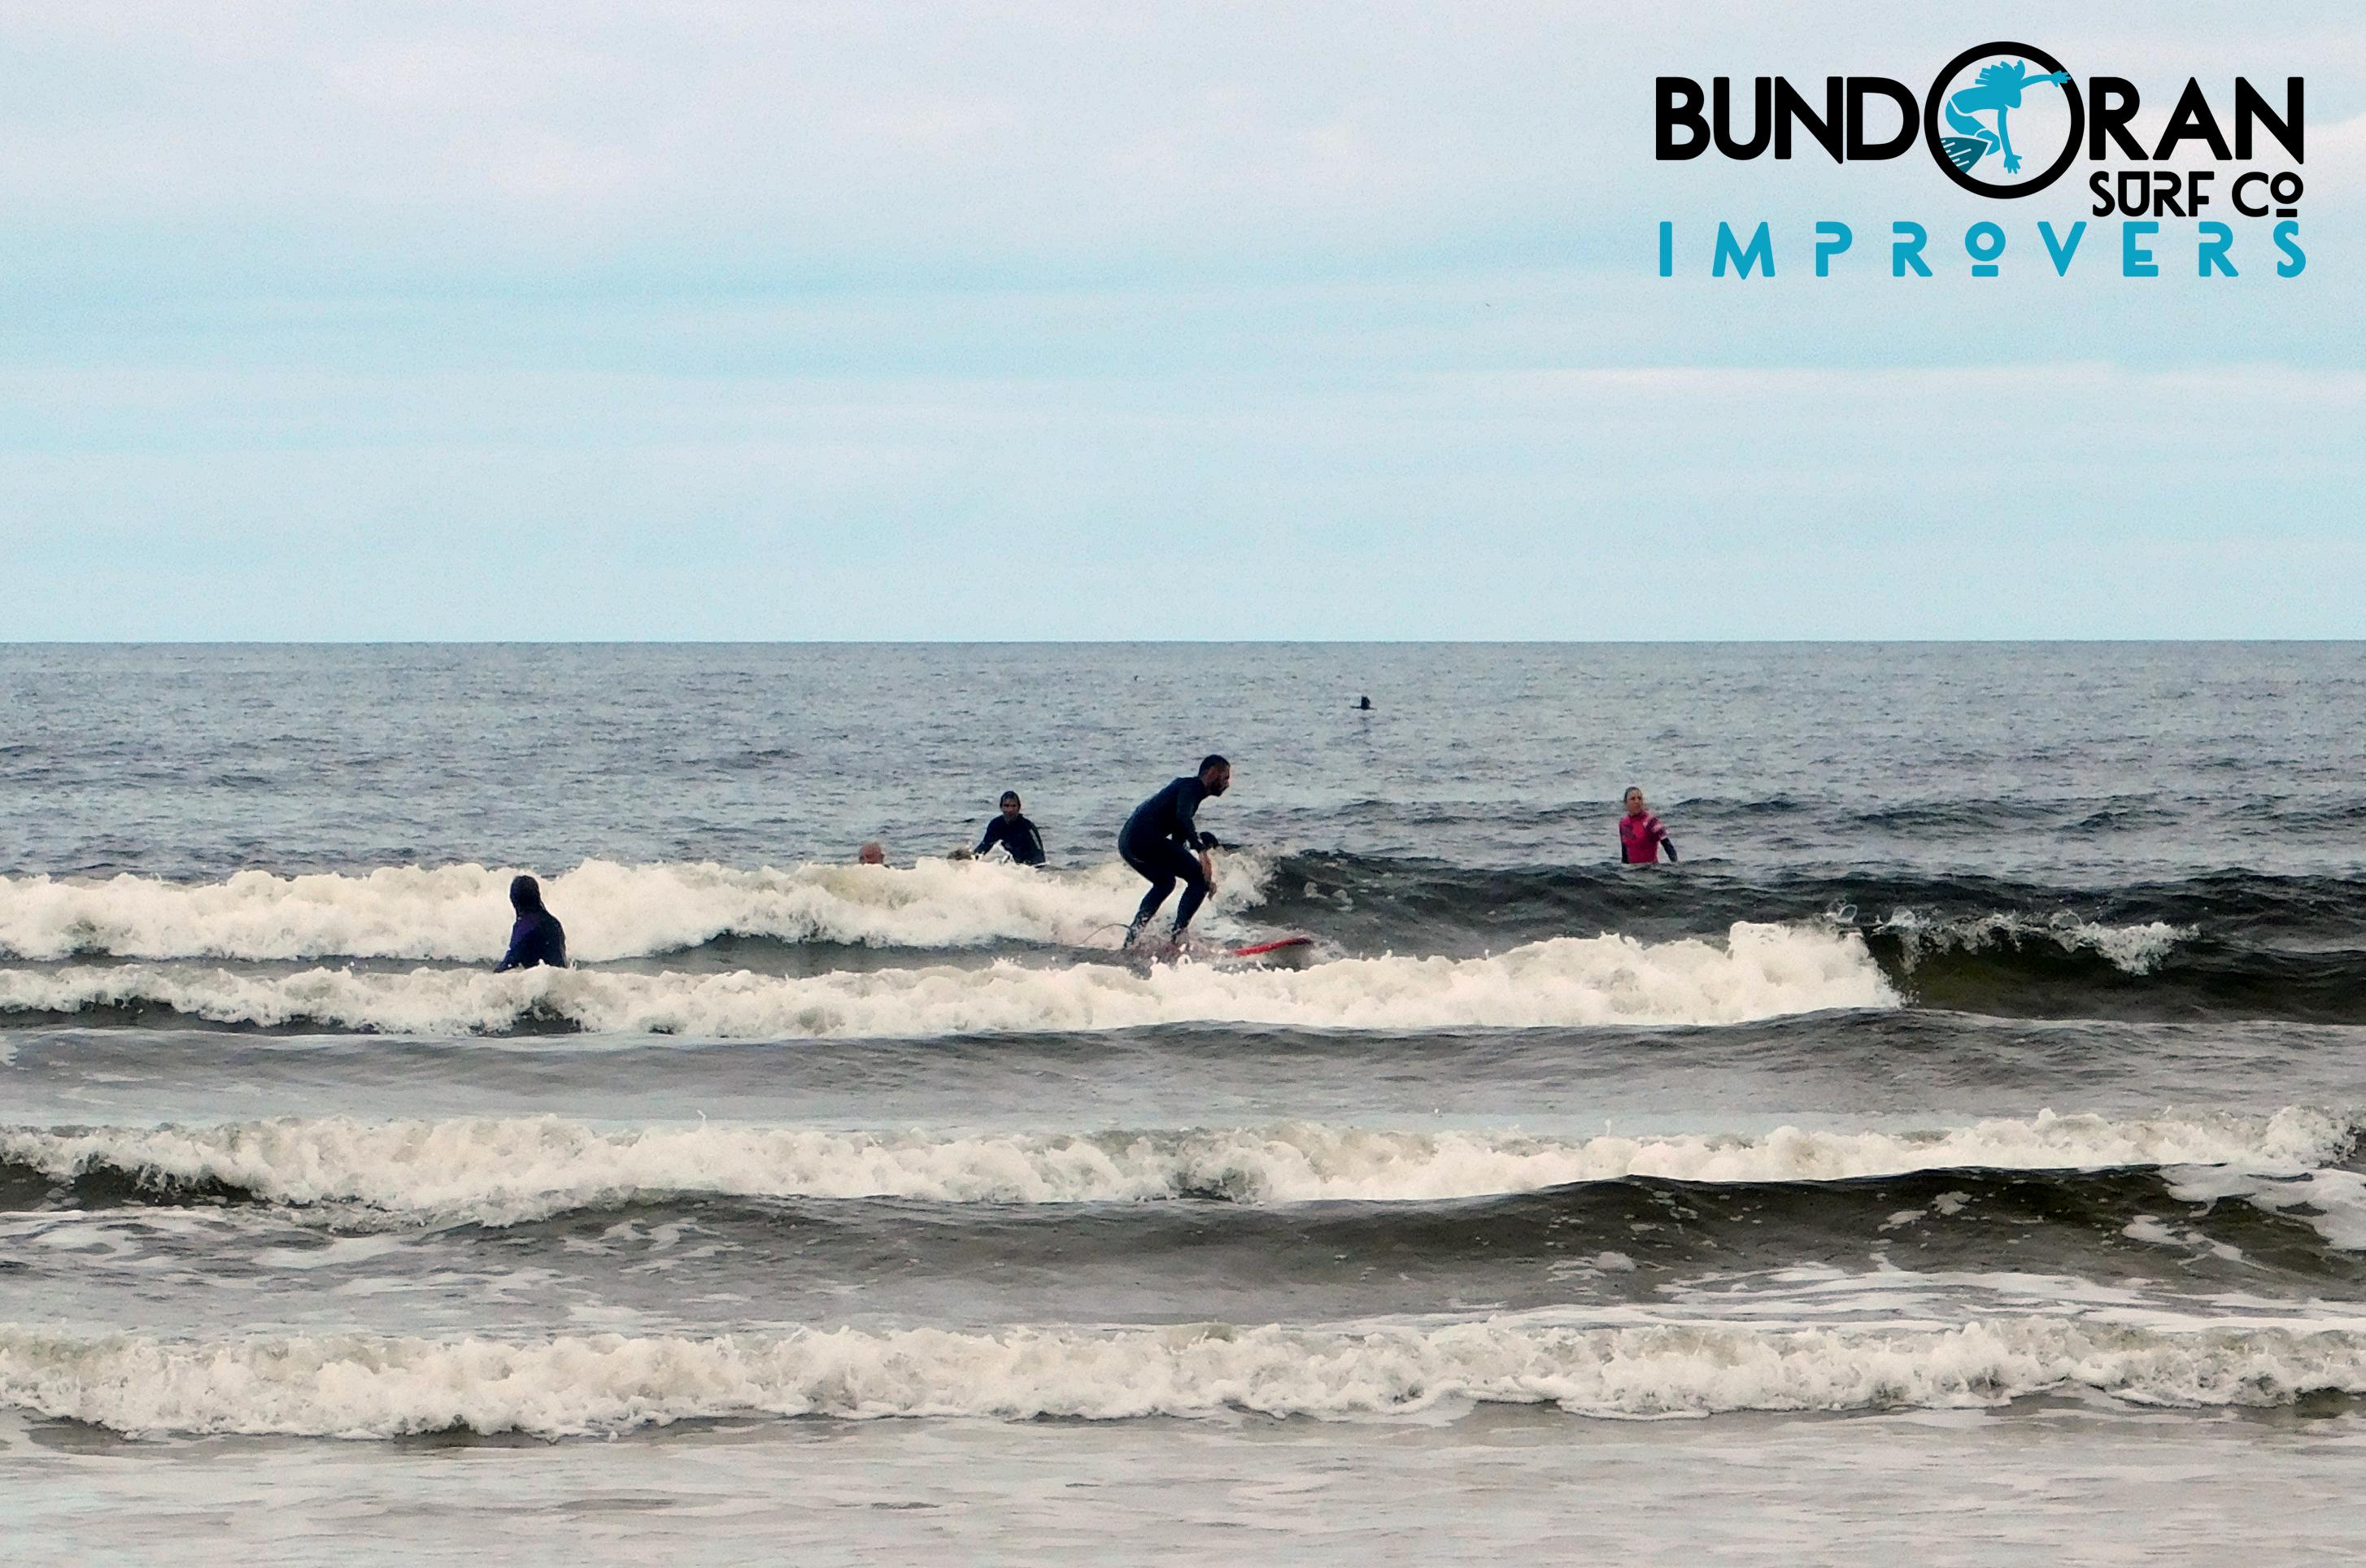 Getting to Bundoran - Discover Bundoran